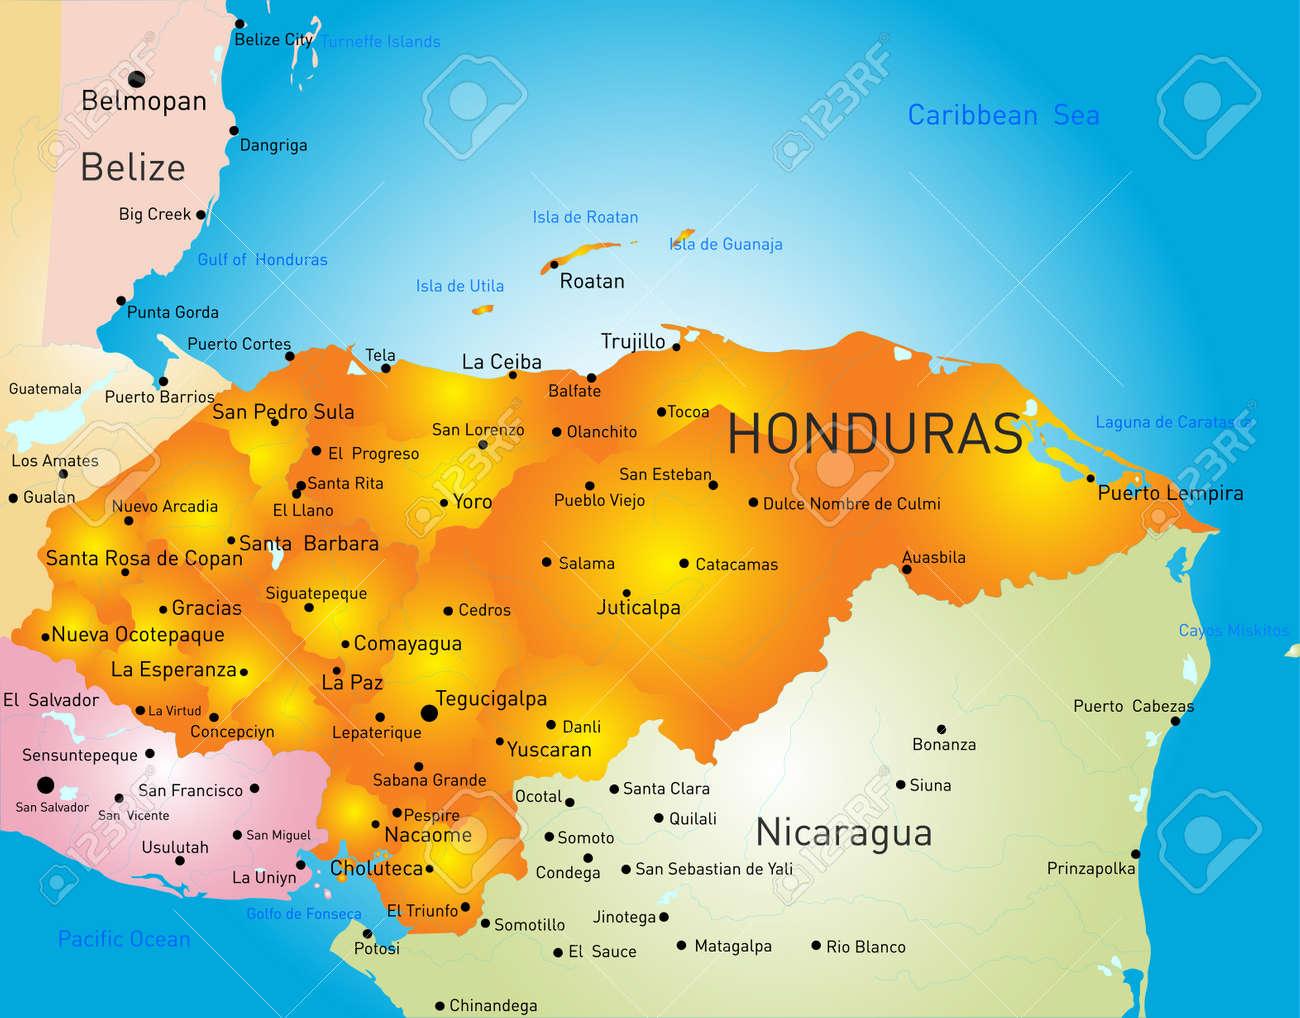 Honduras Country Vector Color Map Royalty Free Cliparts Vectors